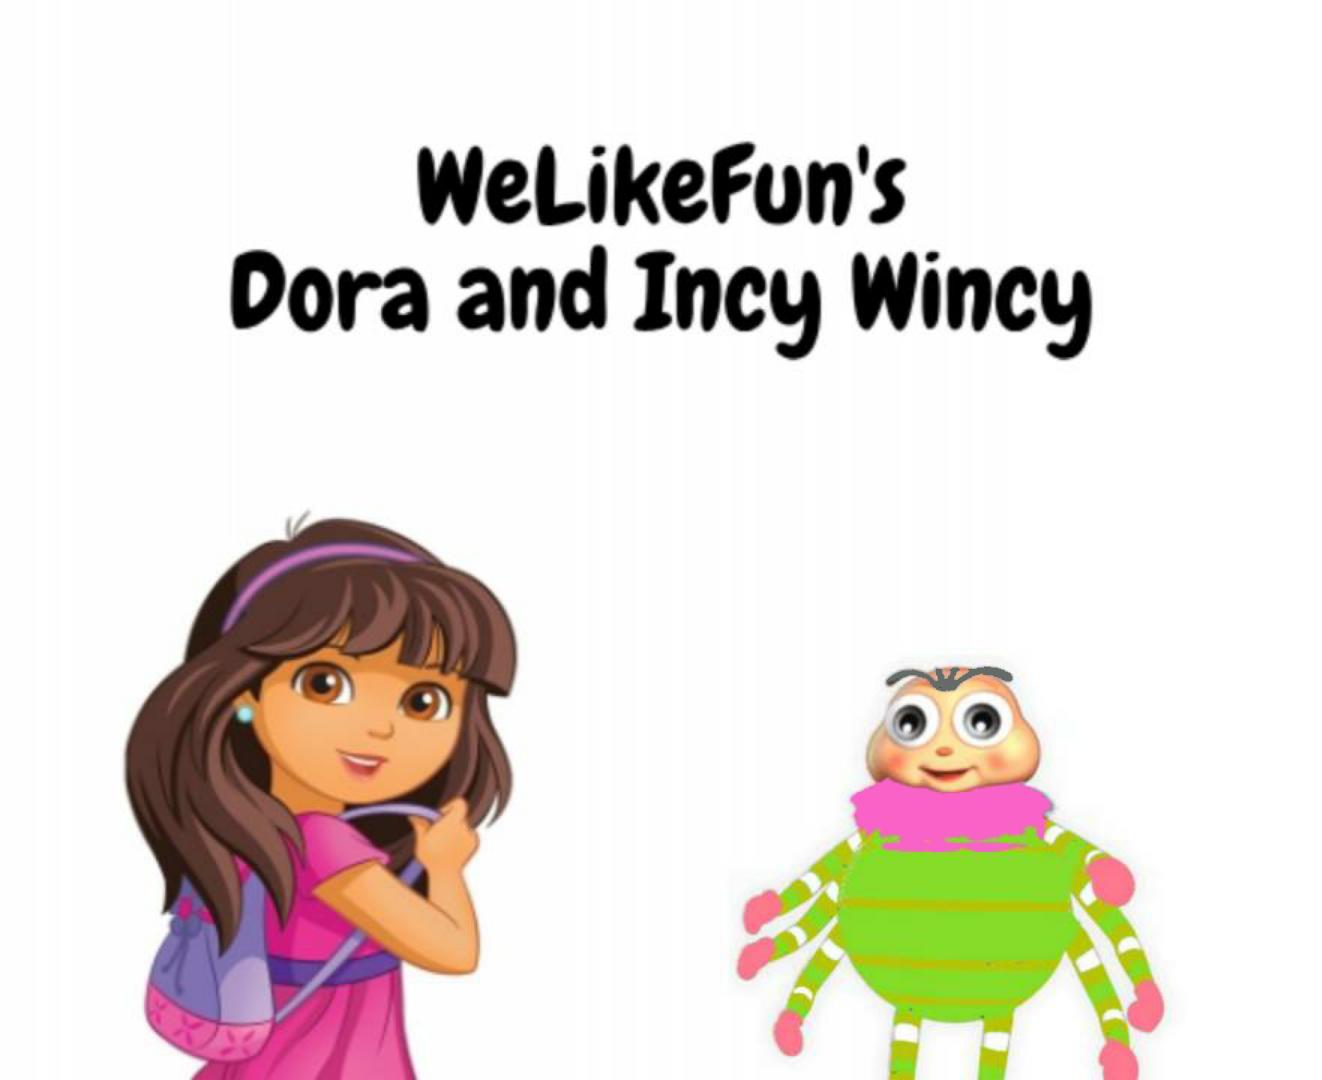 Dora & Incy Wincy